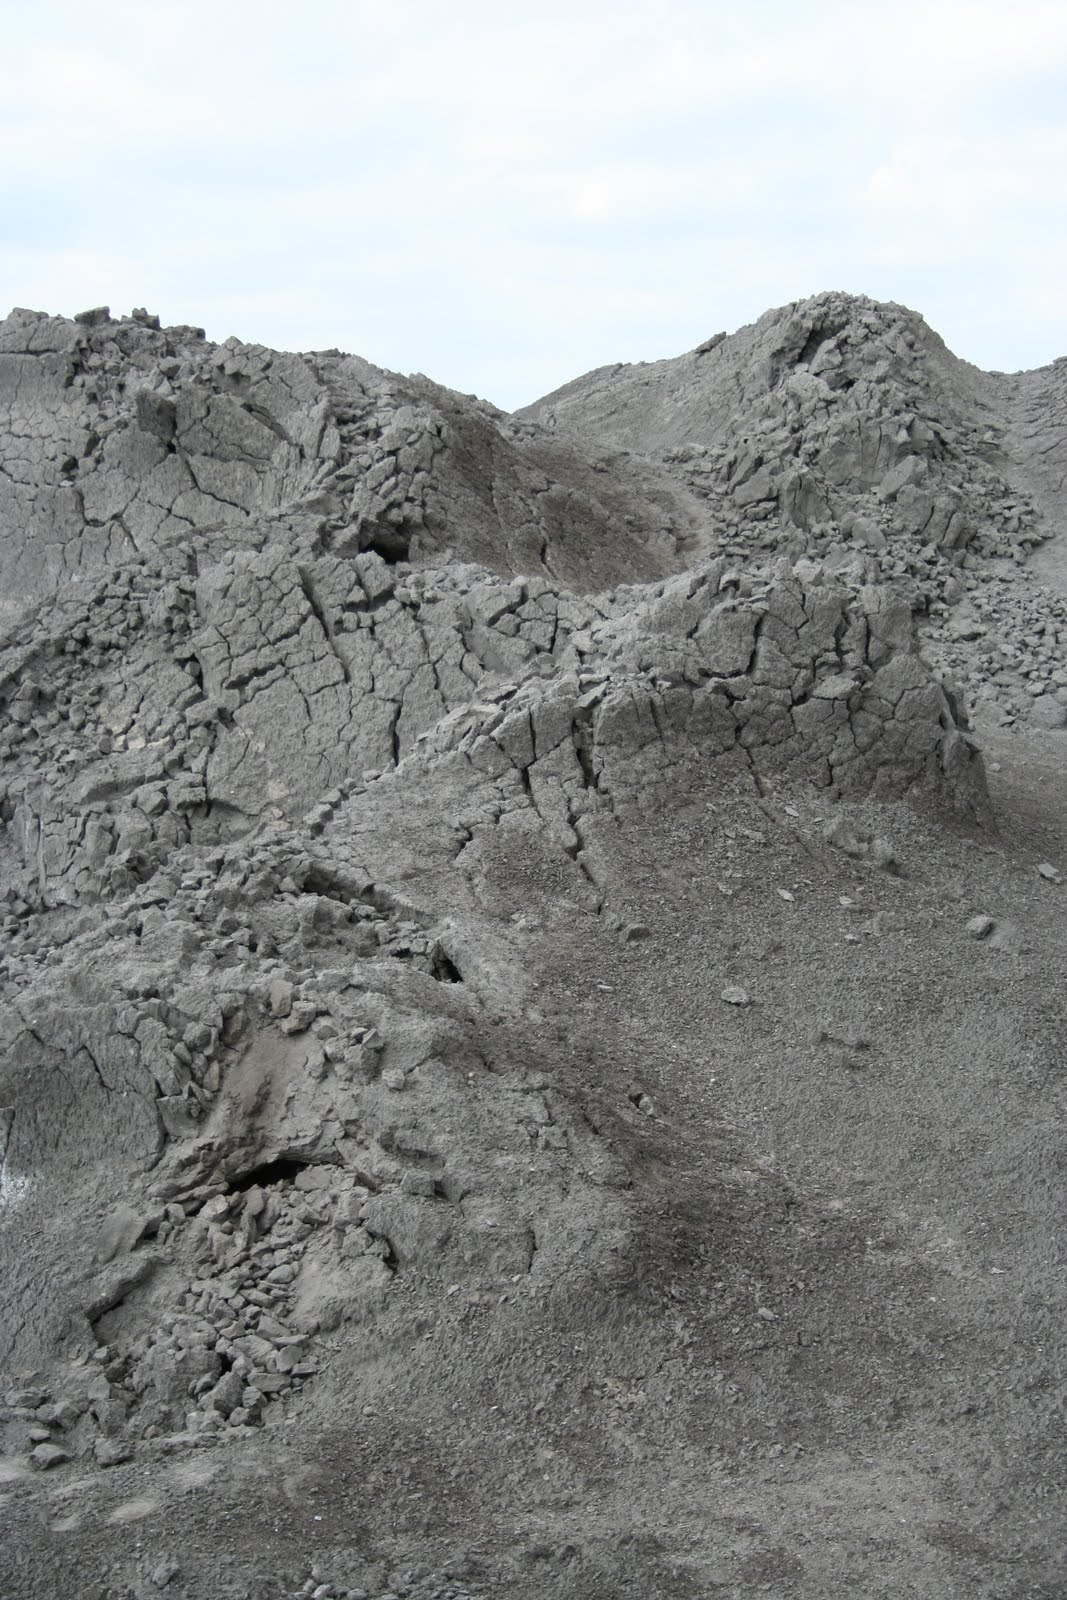 Bokoshe Oklahoma Home of a fly ash dump site